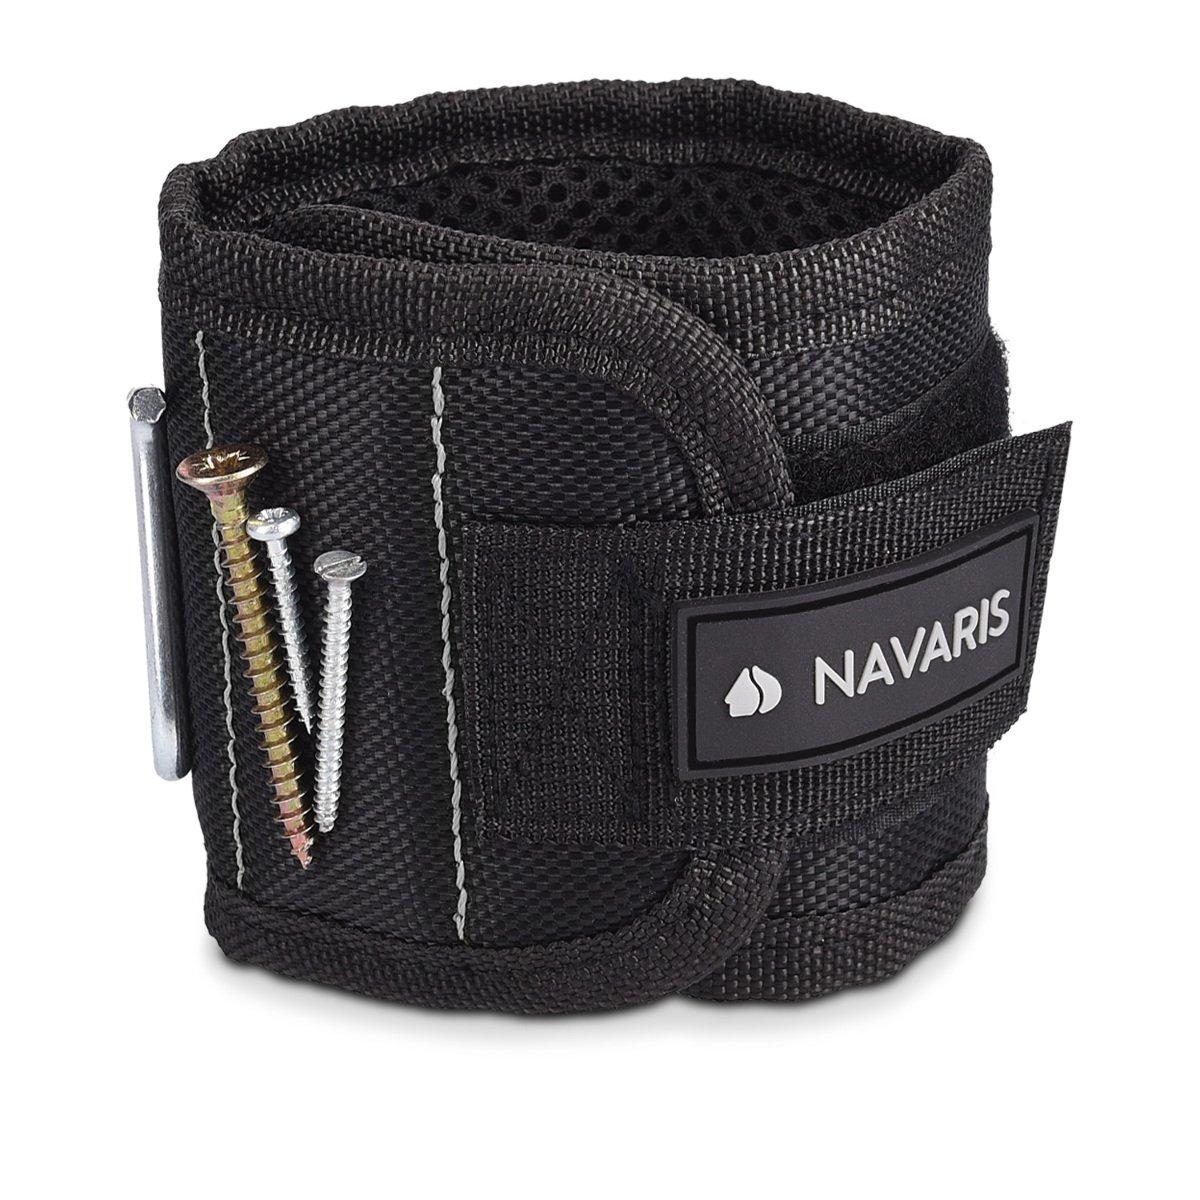 Navaris Magnetic bracelet for metallic items - With 5 strong magnets - Magnetic bracelet for screws nails bits needles - Black gray